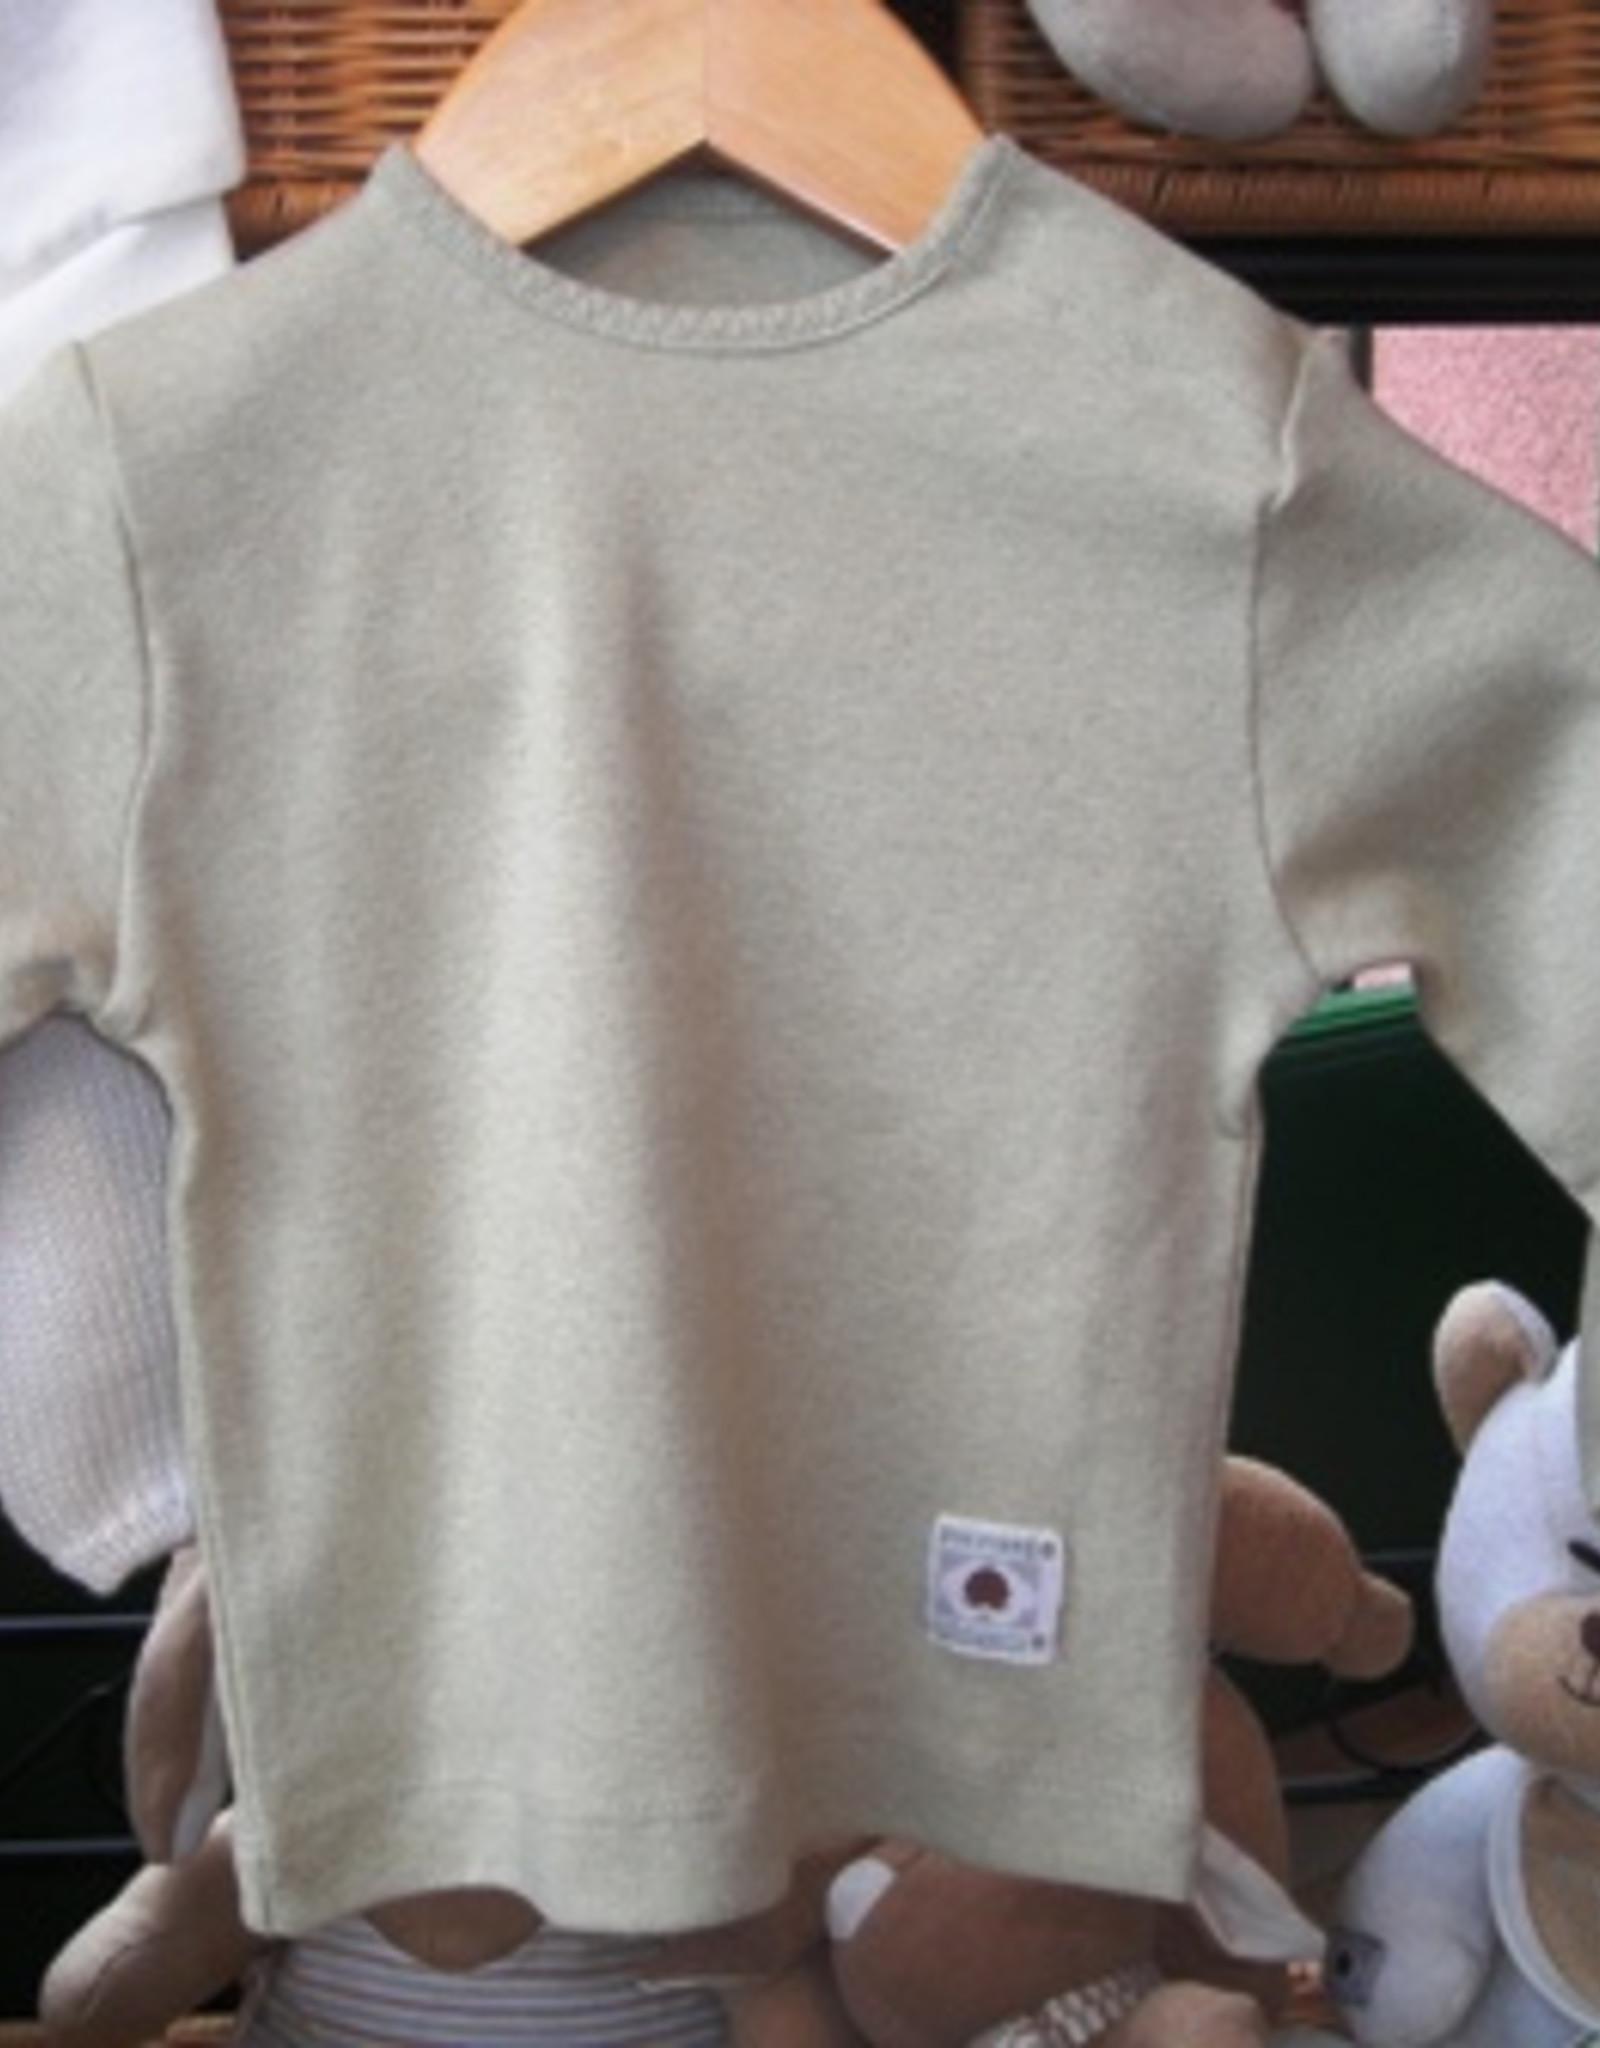 Baby t shirt zigzag. sizes 1, 3, 6 months.